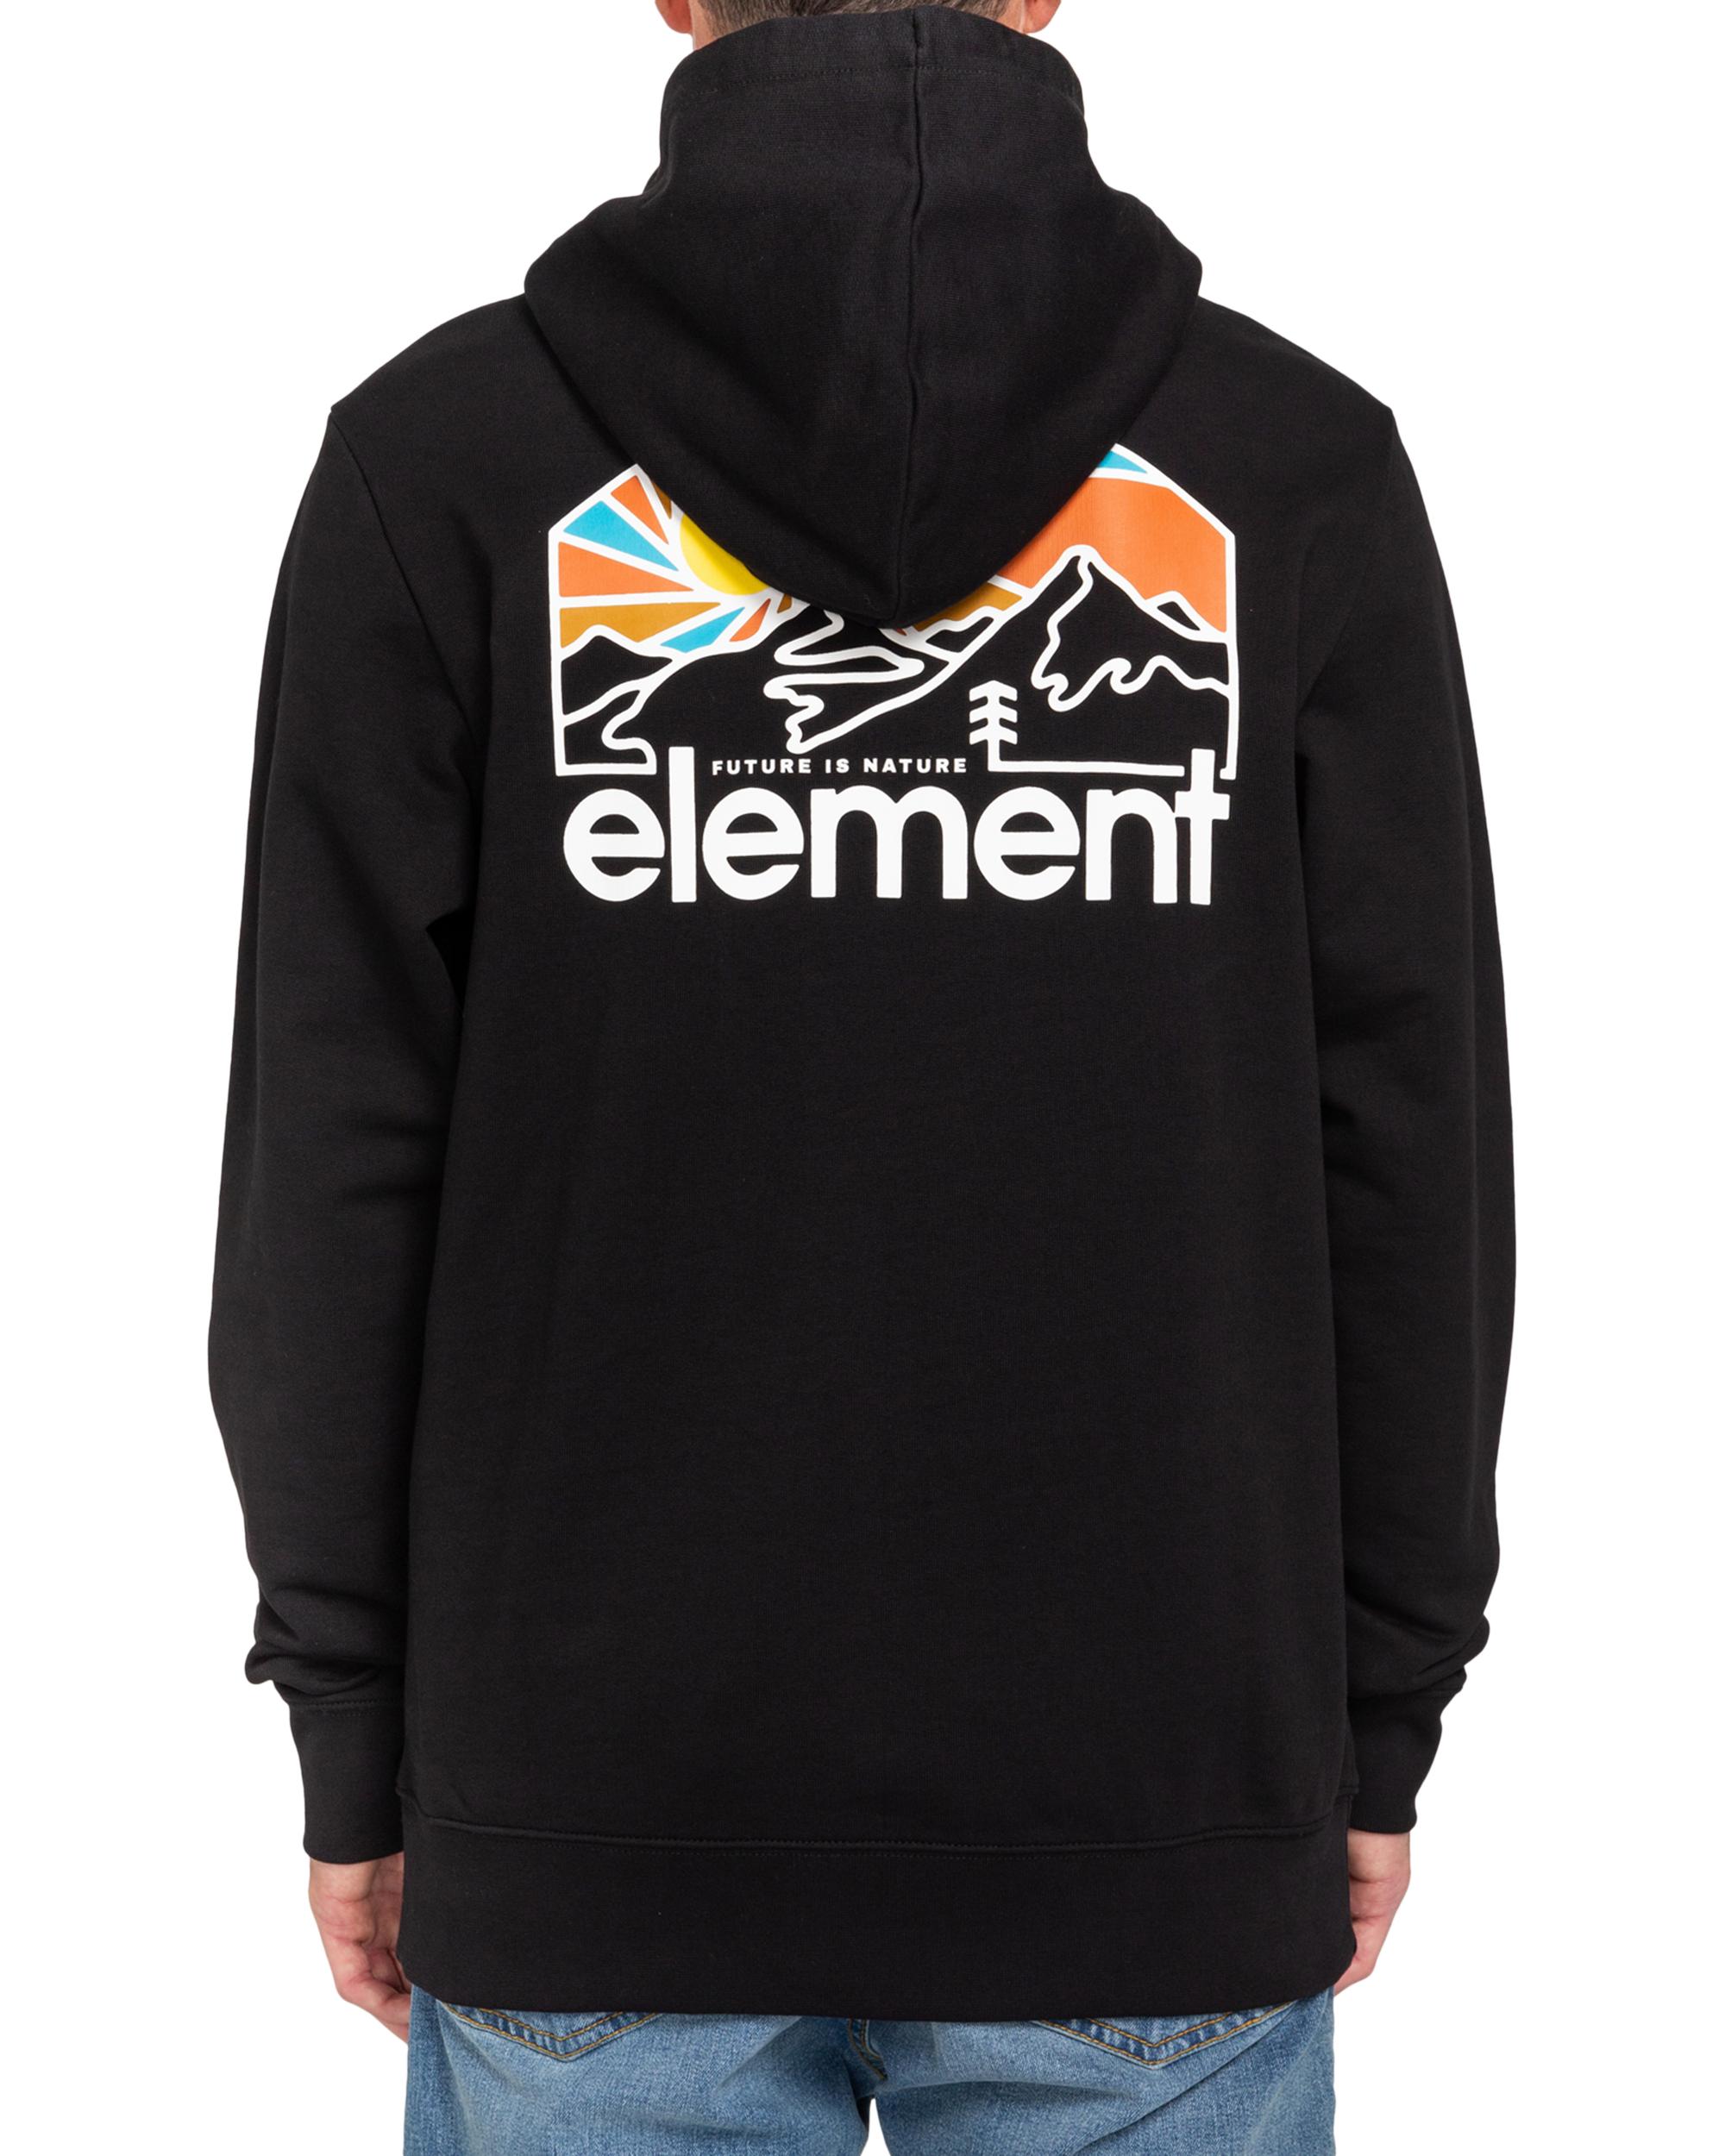 Element Sunnett hoodie, black, x-large